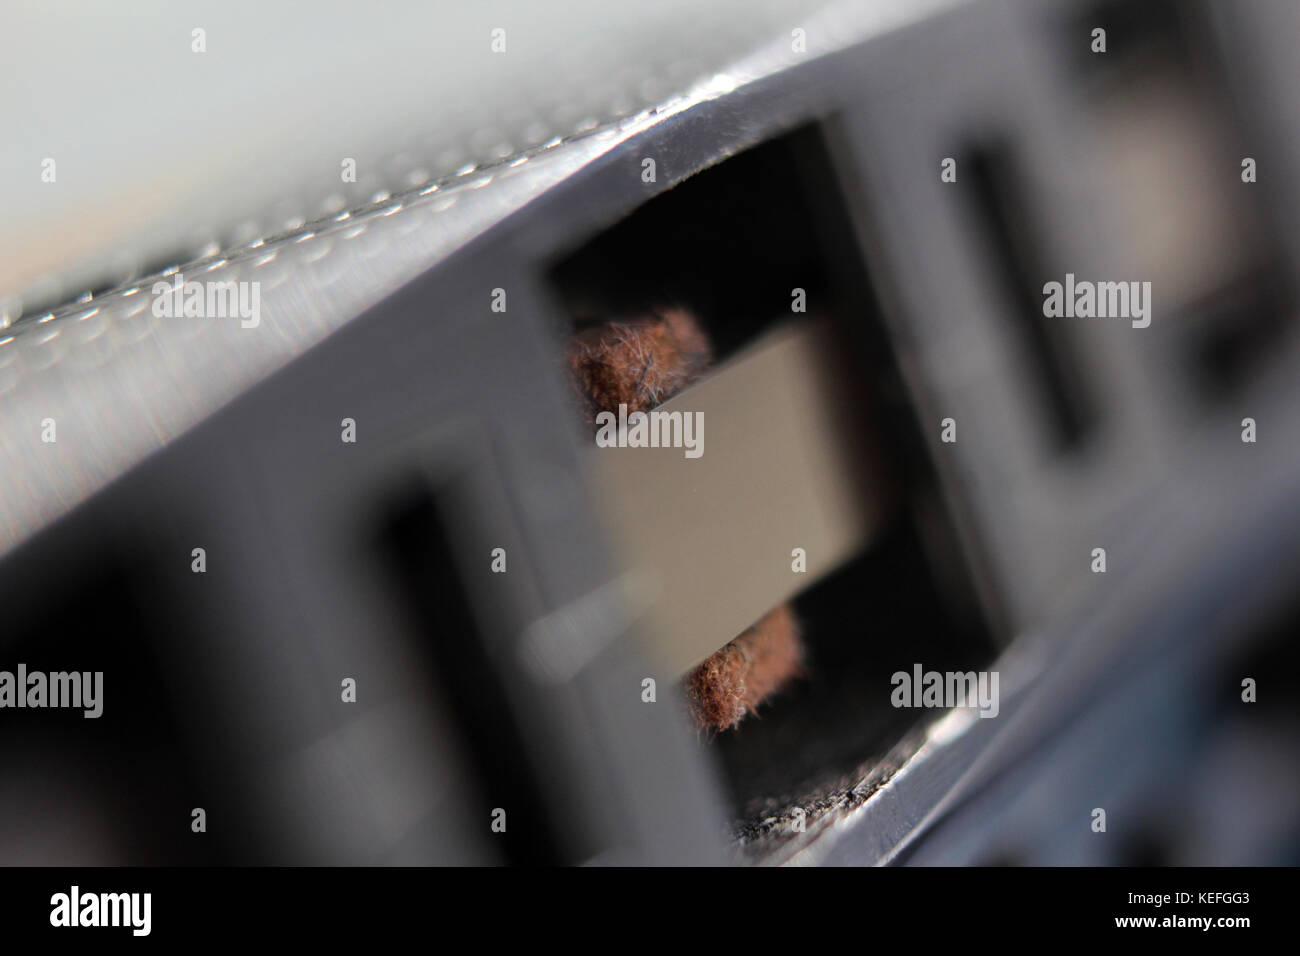 Audio tape cassette, close-up - Stock Image